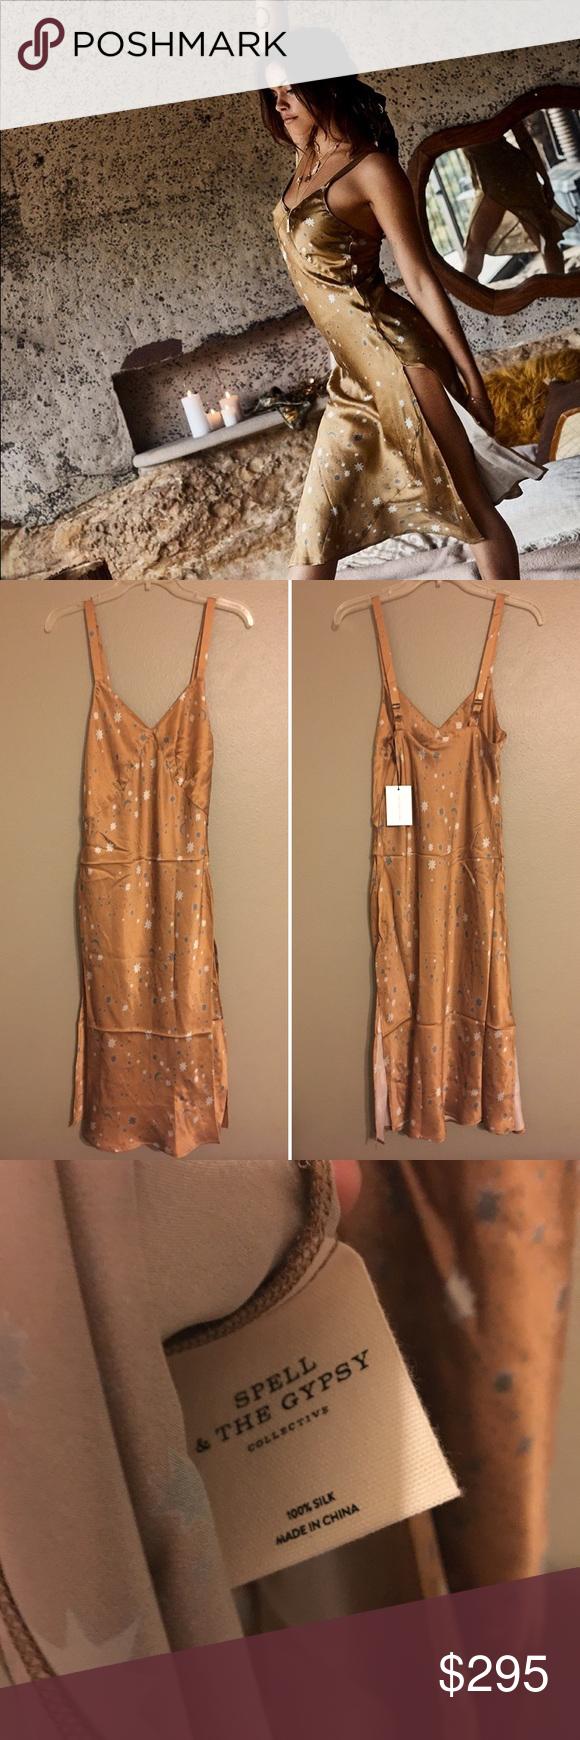 9ddf97b6e4122 Spell Designs Stargazer Silk Slip Dress in Moon BNWT, Limited Edition  Stargazer Slip Dress. Size Medium. Price is firm. Spell & The Gypsy  Collective Dresses ...